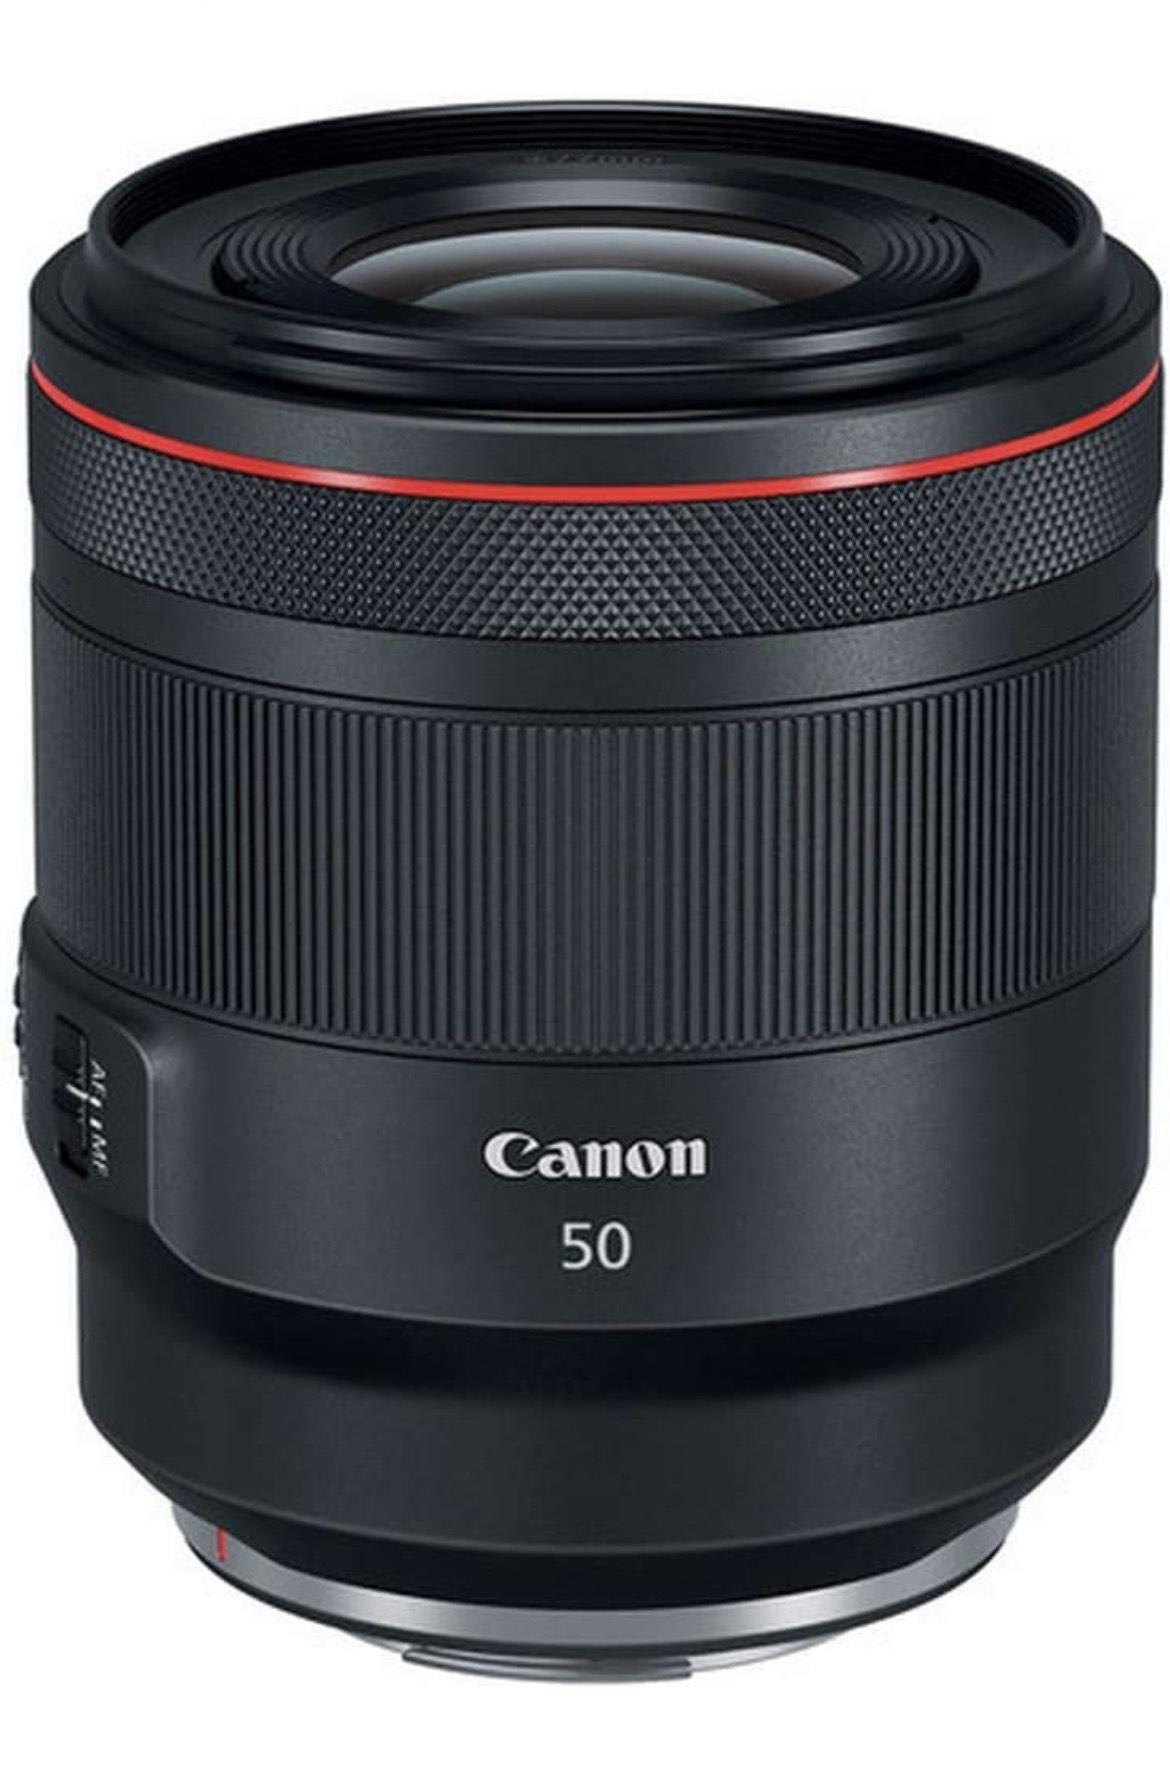 [Précommande] Objectif Canon RF 50mm - F1.2L, USM